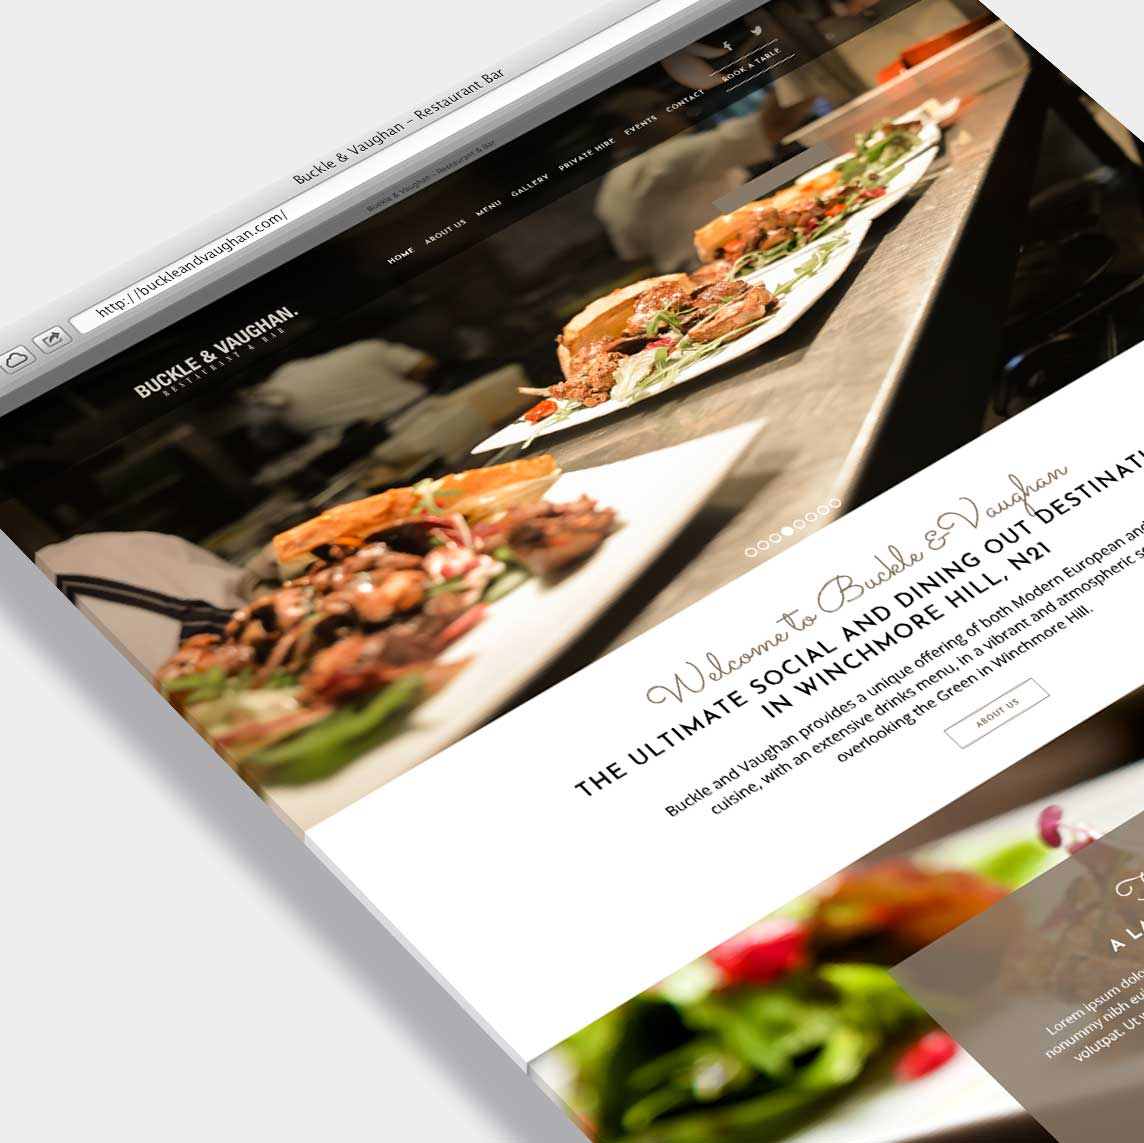 Degraf - Web Design and Build